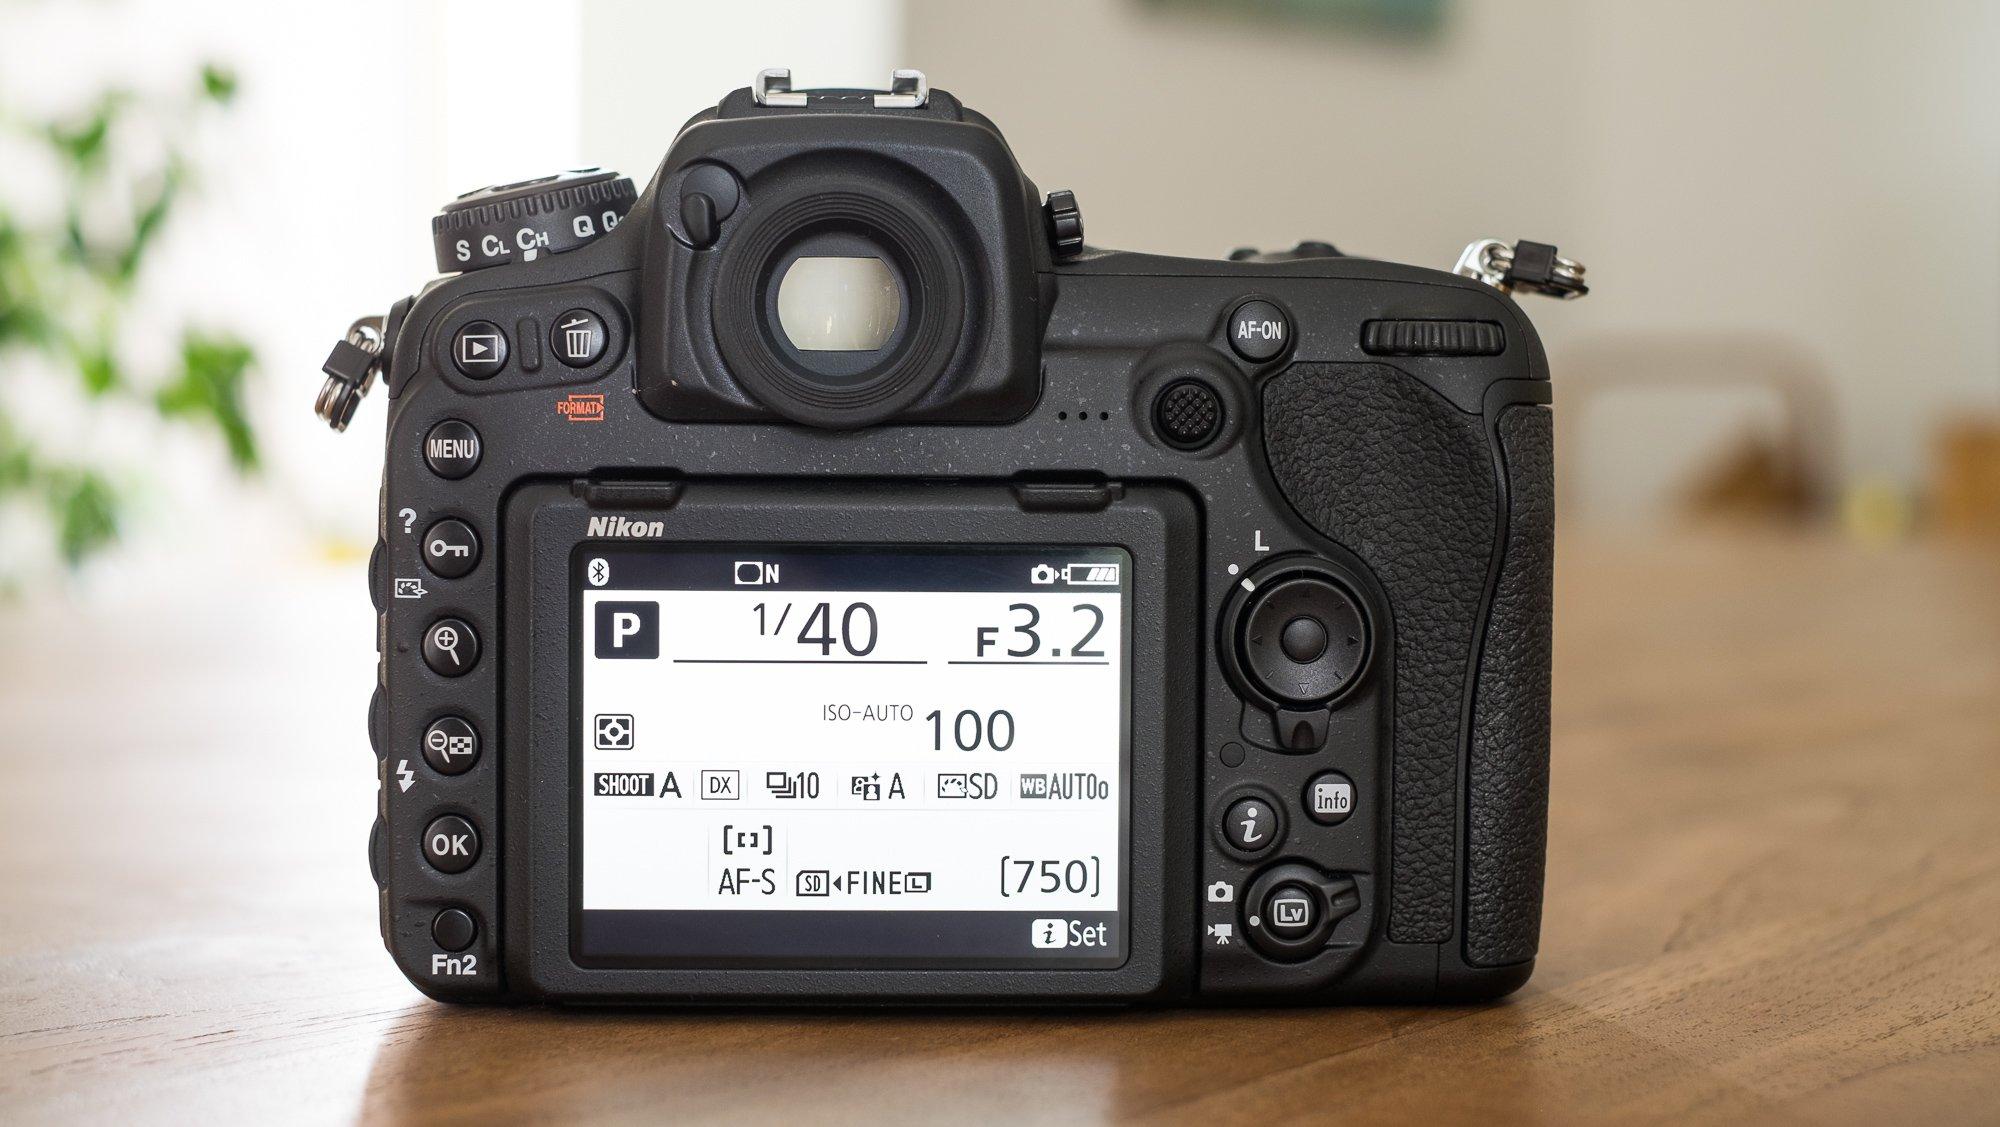 Nikon D500 Review A Joyful Experience With Rewarding